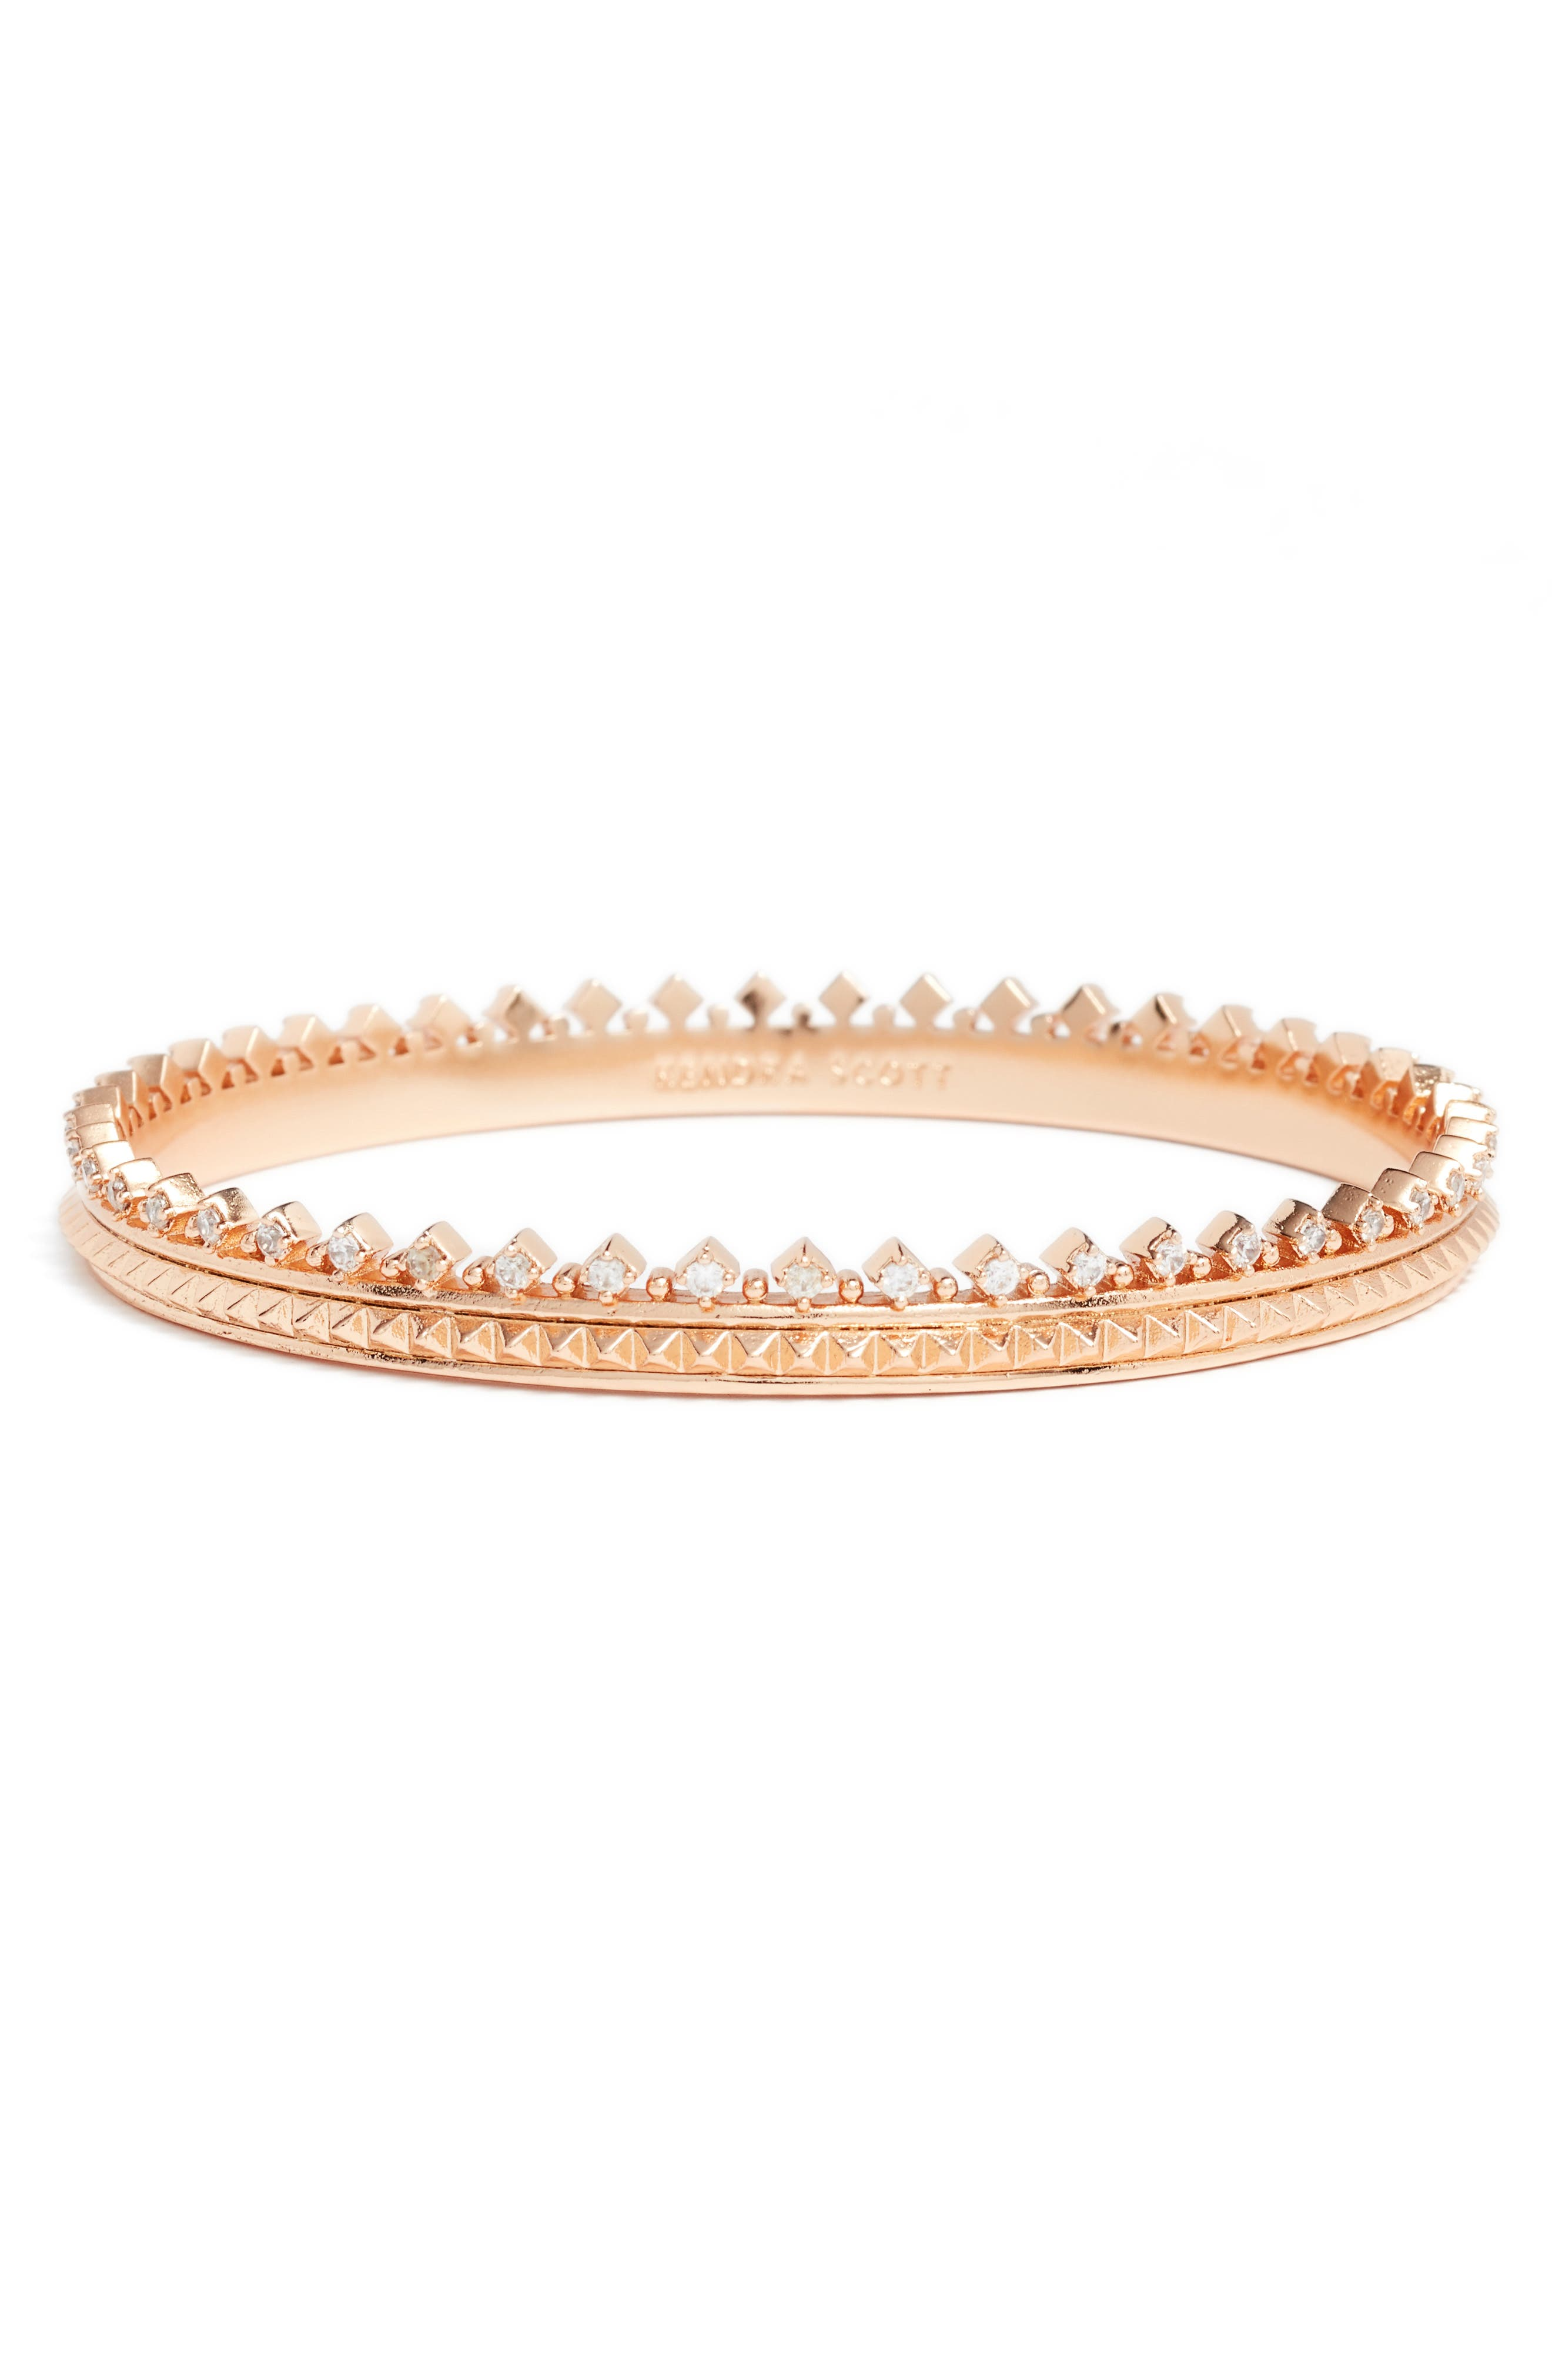 Mary Caroline Crystal Pyramid Cuff Bracelet,                             Main thumbnail 1, color,                             Rose Gold